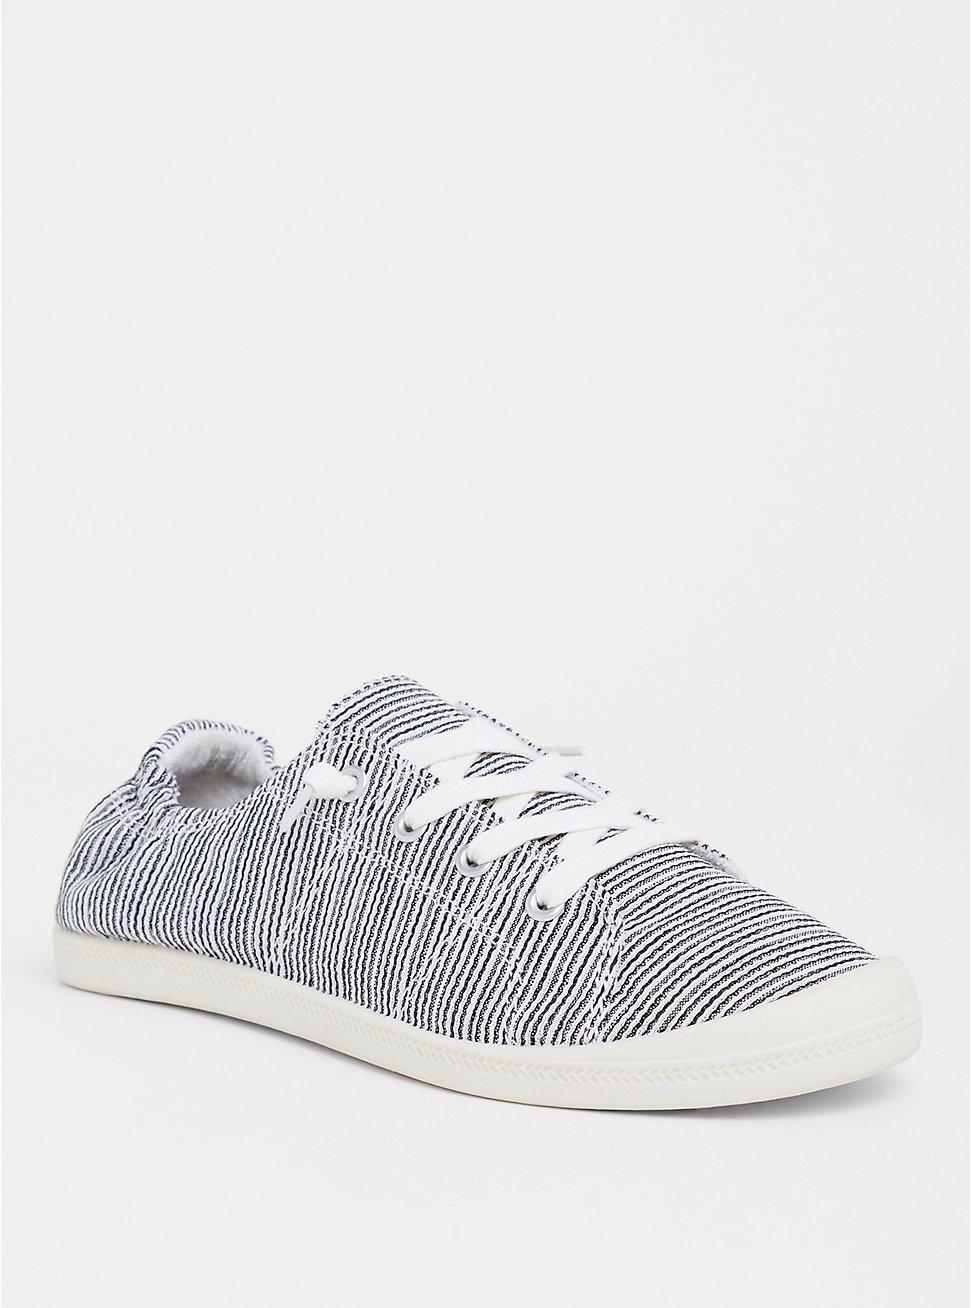 Riley - Stripe Ruched Sneaker (WW), MULTI STRIPE, hi-res